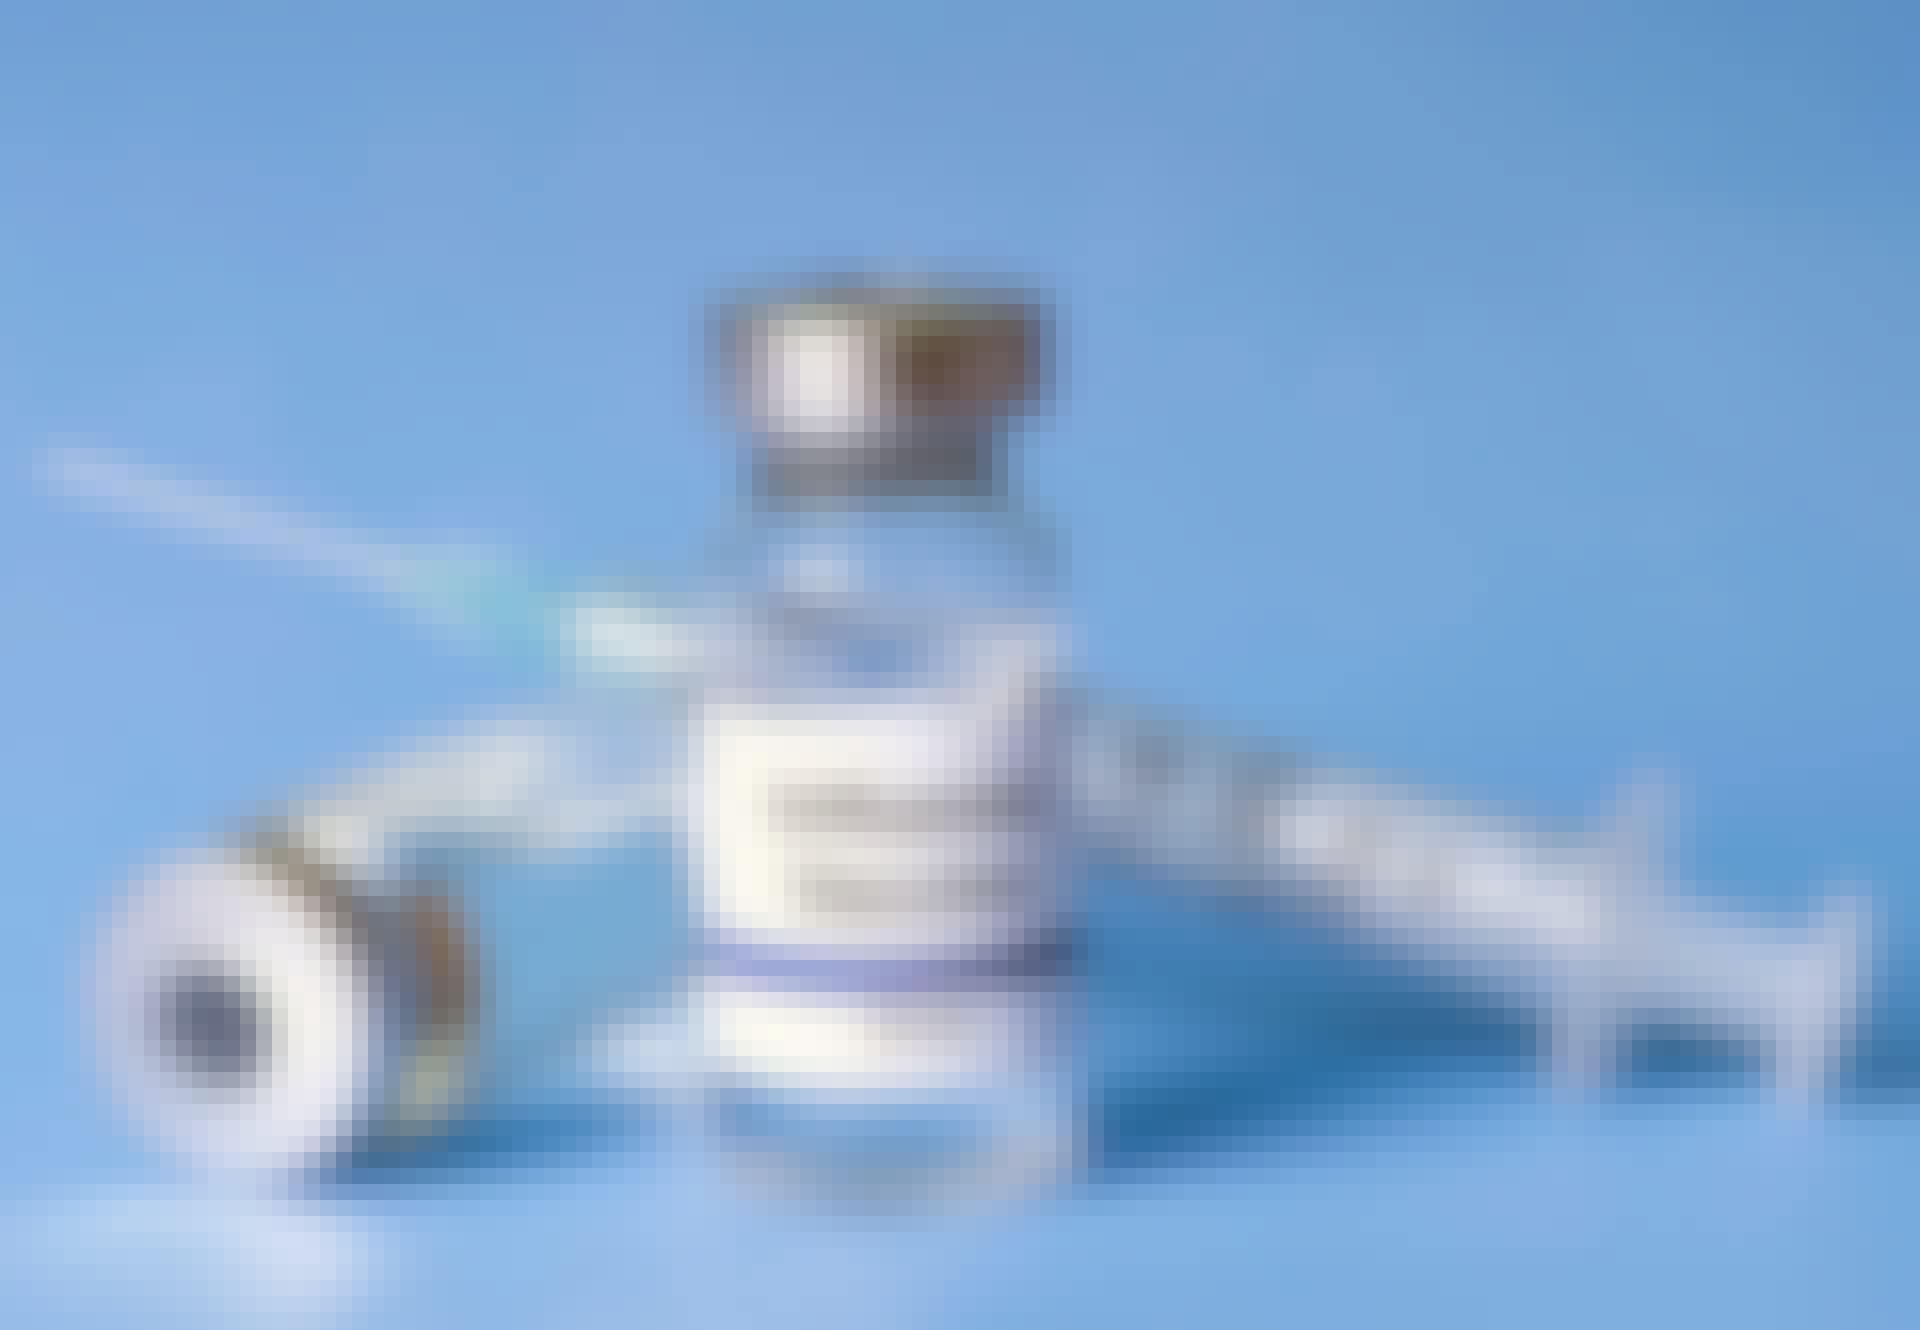 Universel influenza-vaccine